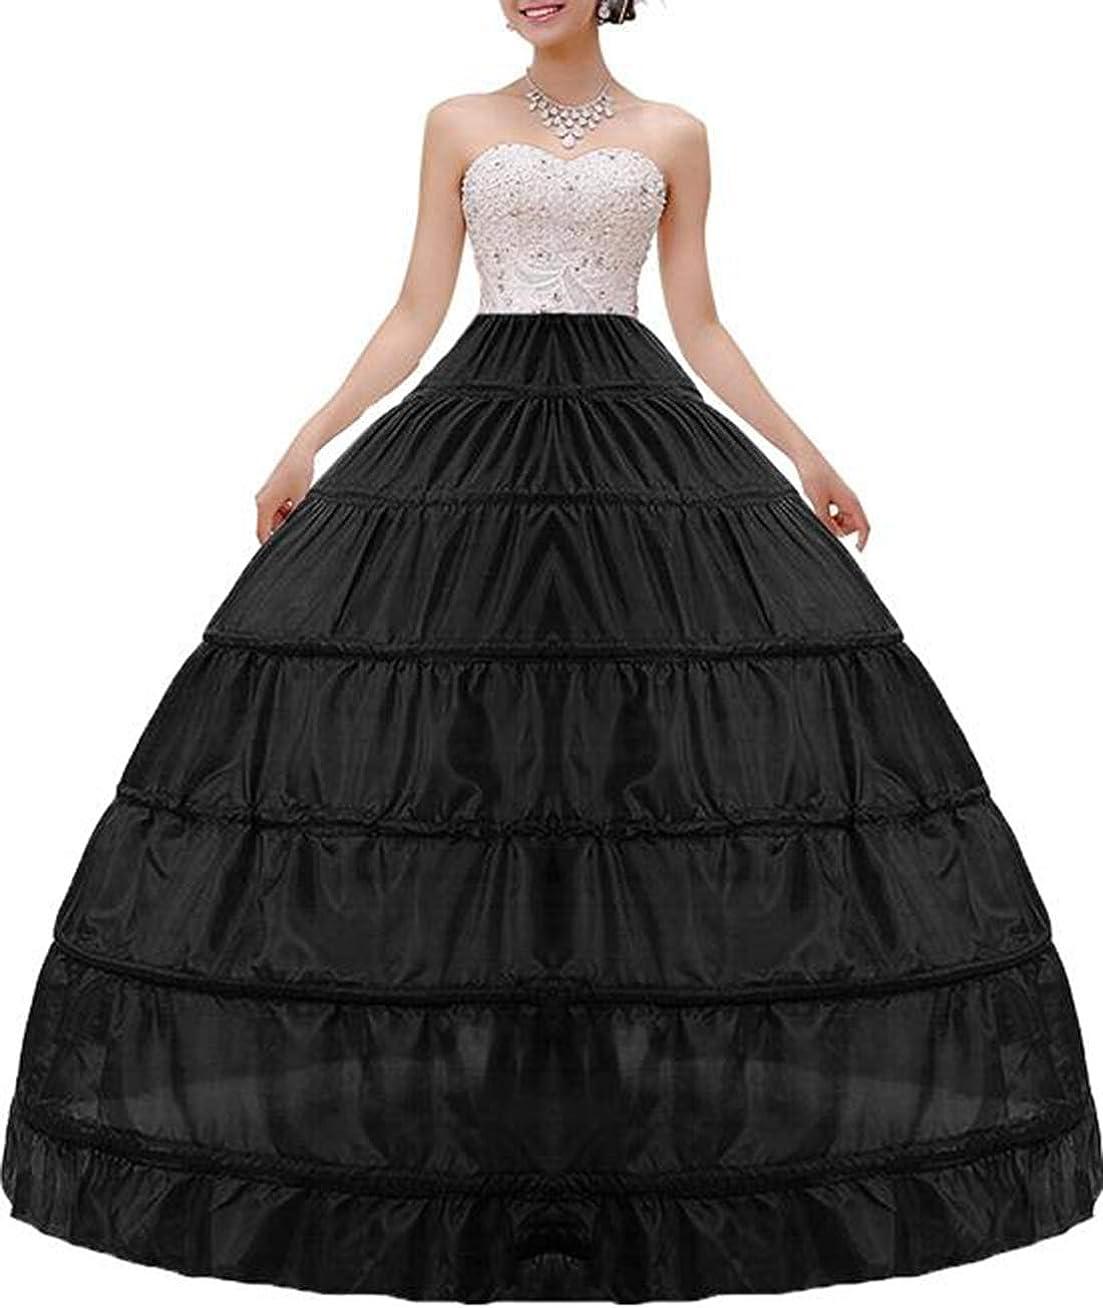 Missveil Women Crinoline Petticoat A Line 6 Hoop Skirt Slips Long